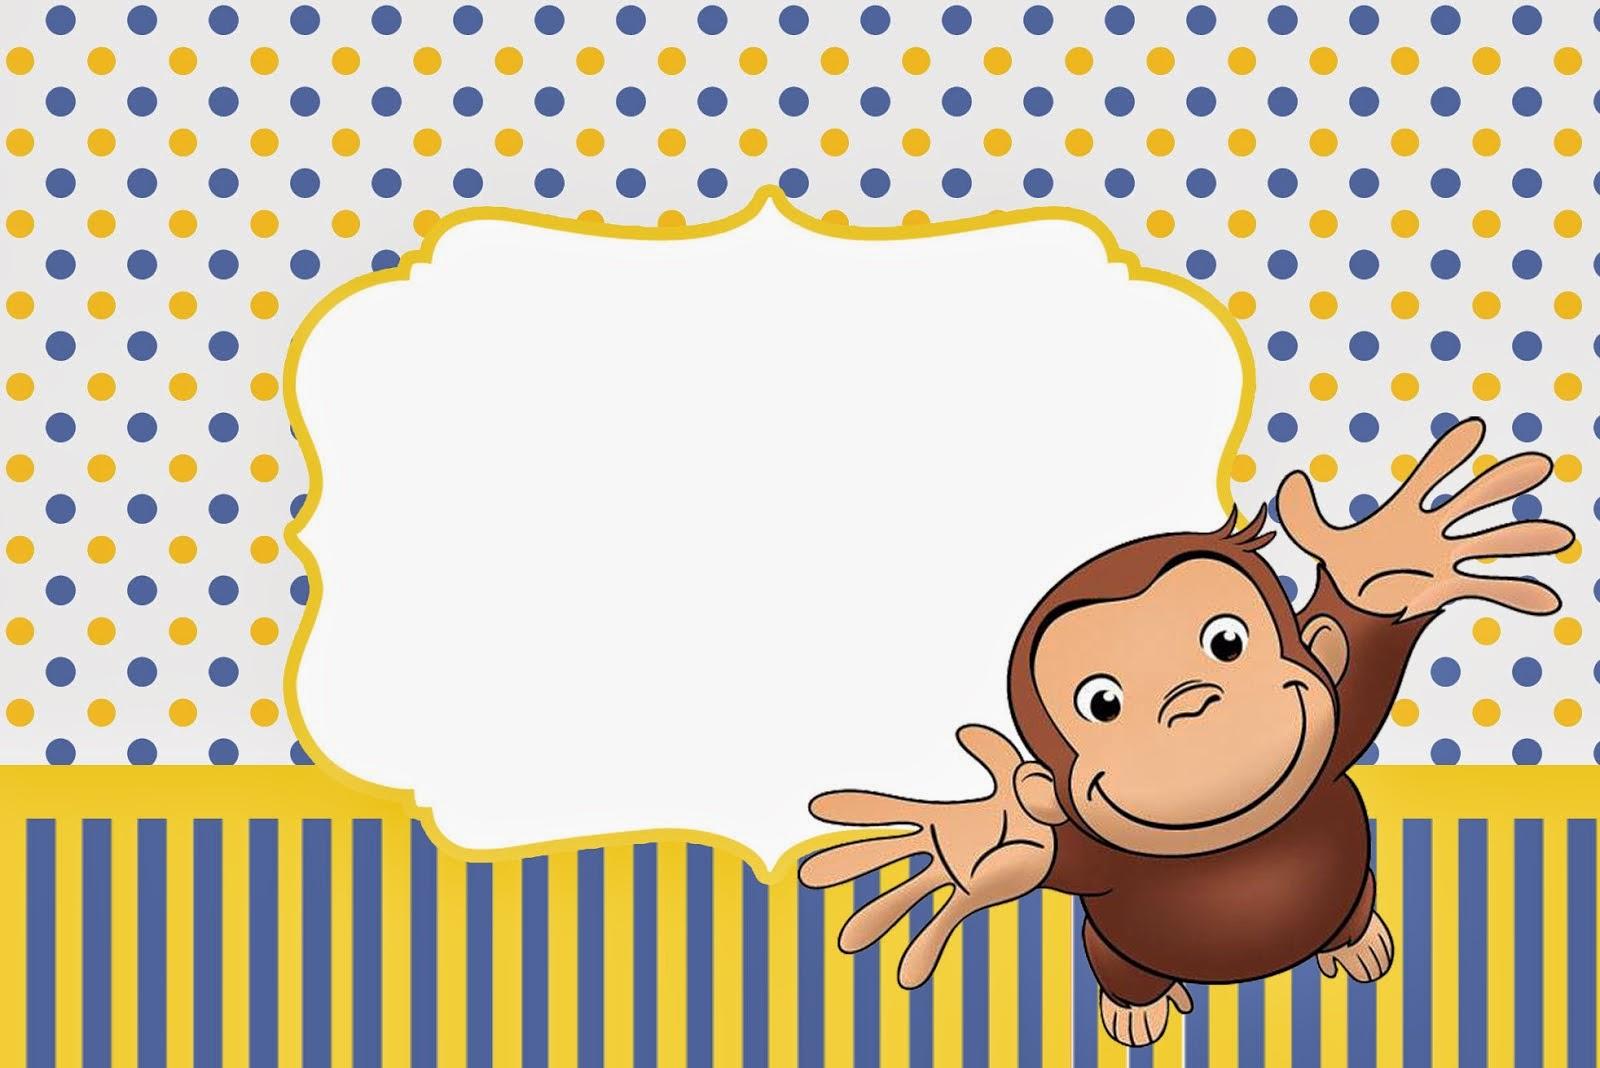 Curious George Free Printable Invitations.   Oh My Fiesta! In English - Free Printable Curious George Invitations